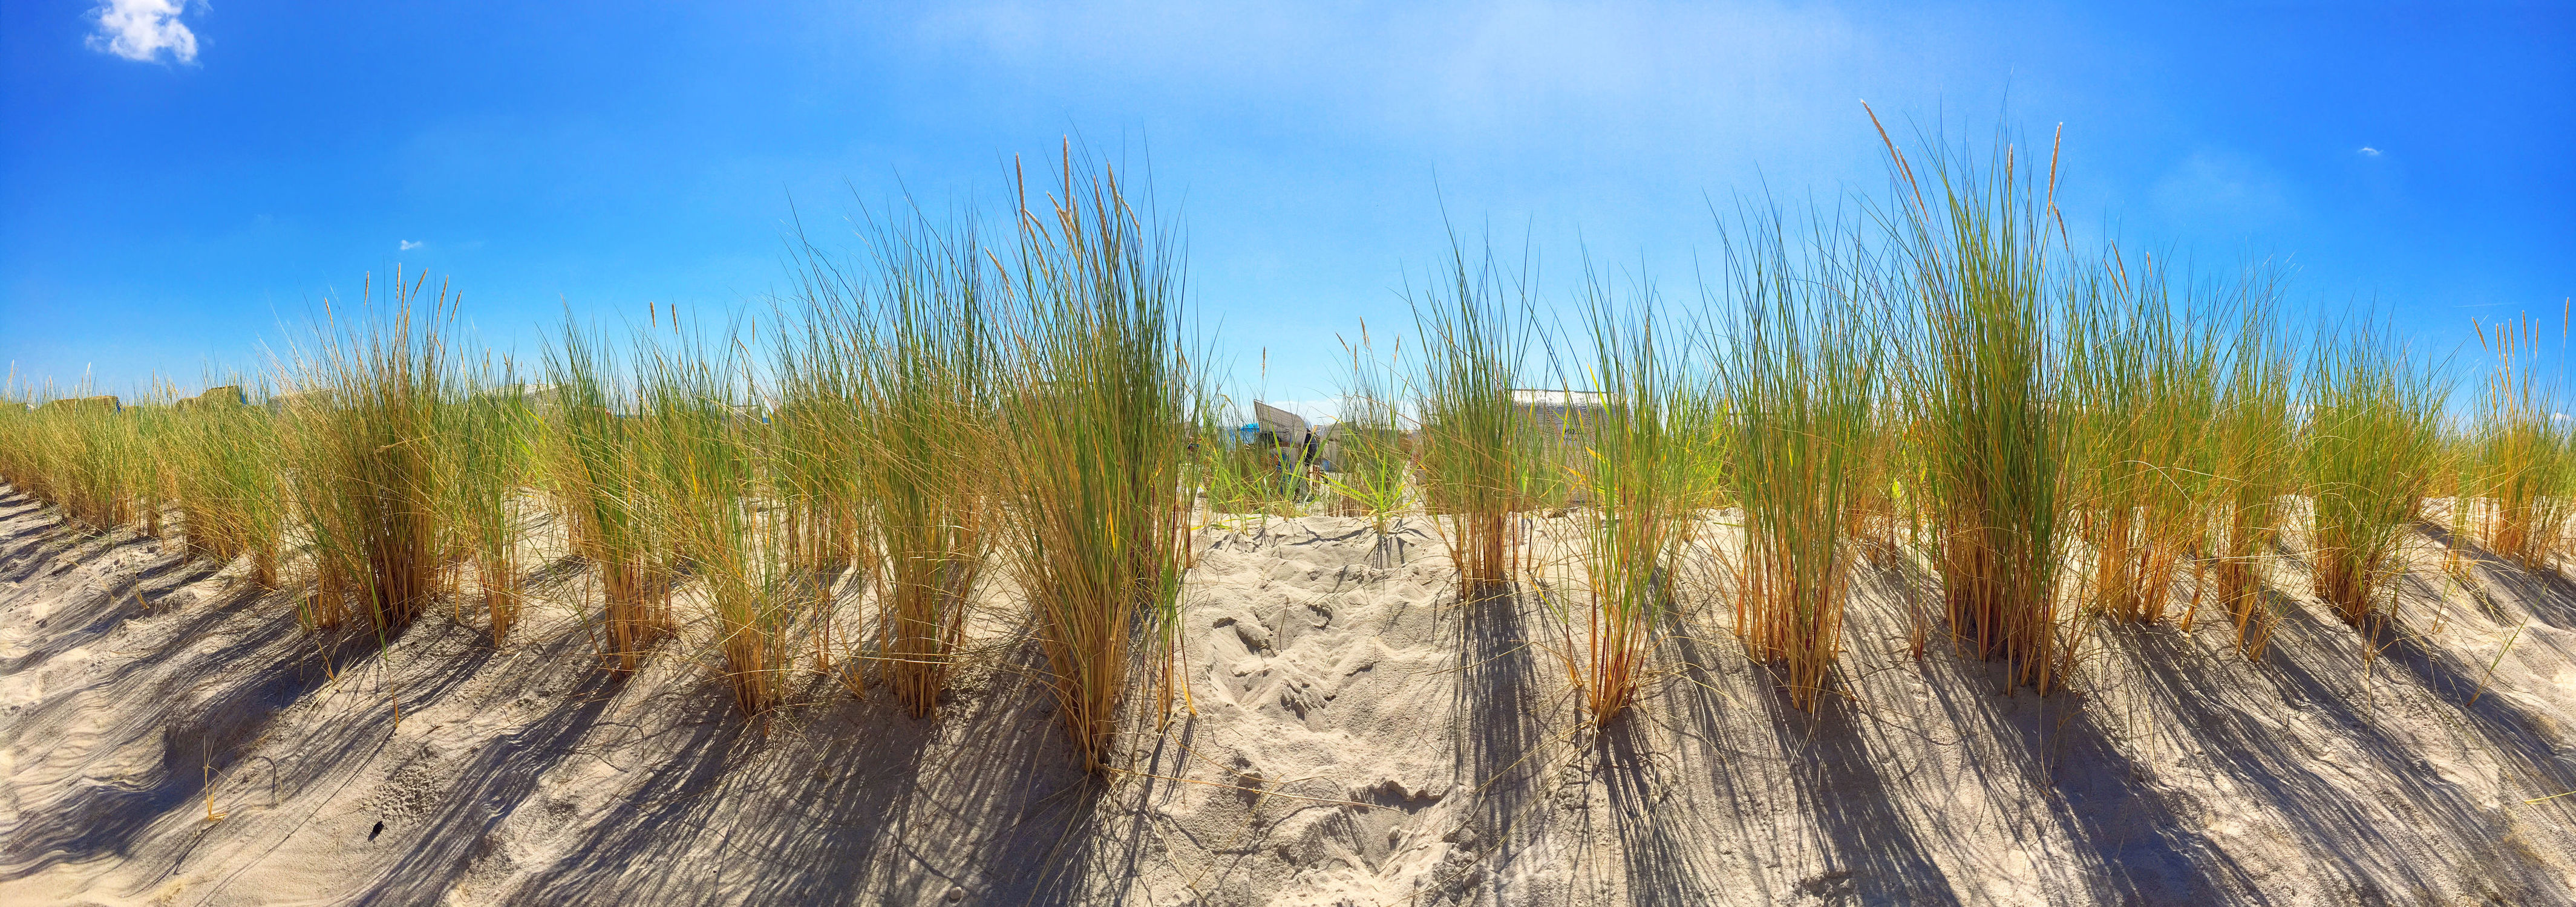 Bild mit Himmel, Sand, Urlaub, Strand, Sandstrand, Panorama, Düne, Dünengras, Holliday, Schilfgras, Dünen Schilf, Strandpflanzen, Strandpflanze, Dünen panorama, Dünenblick